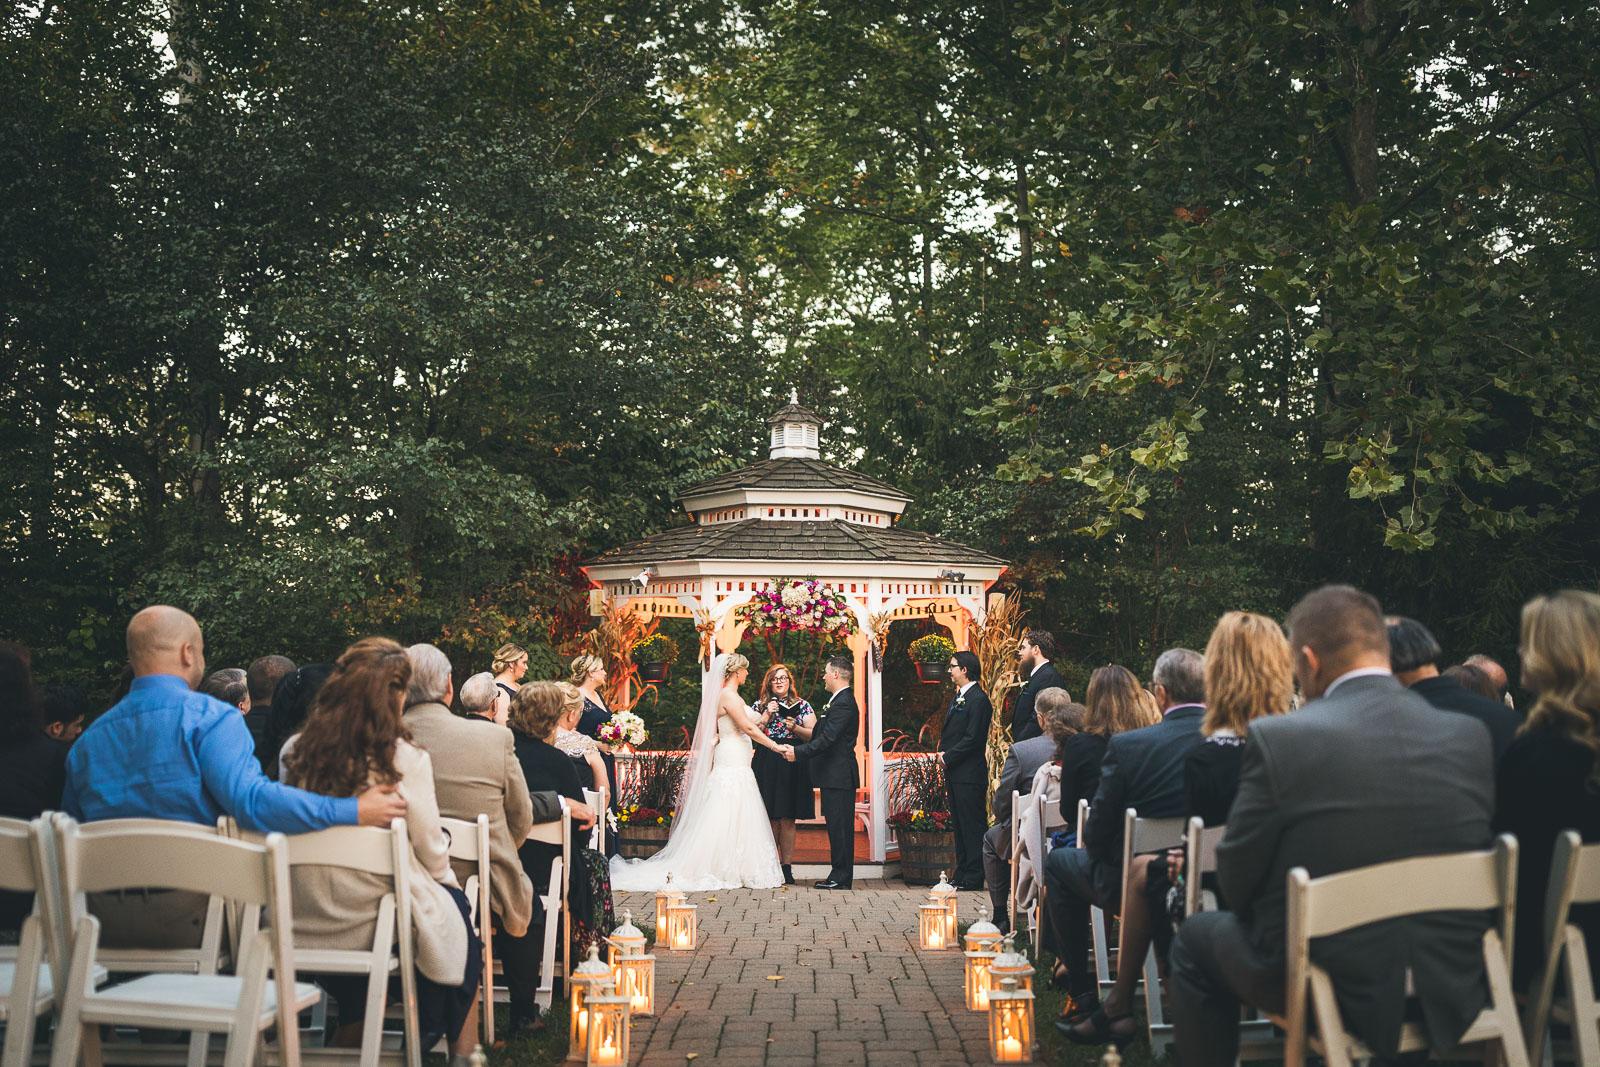 Wedding Ceremony The Grain House Olde Mill Inn